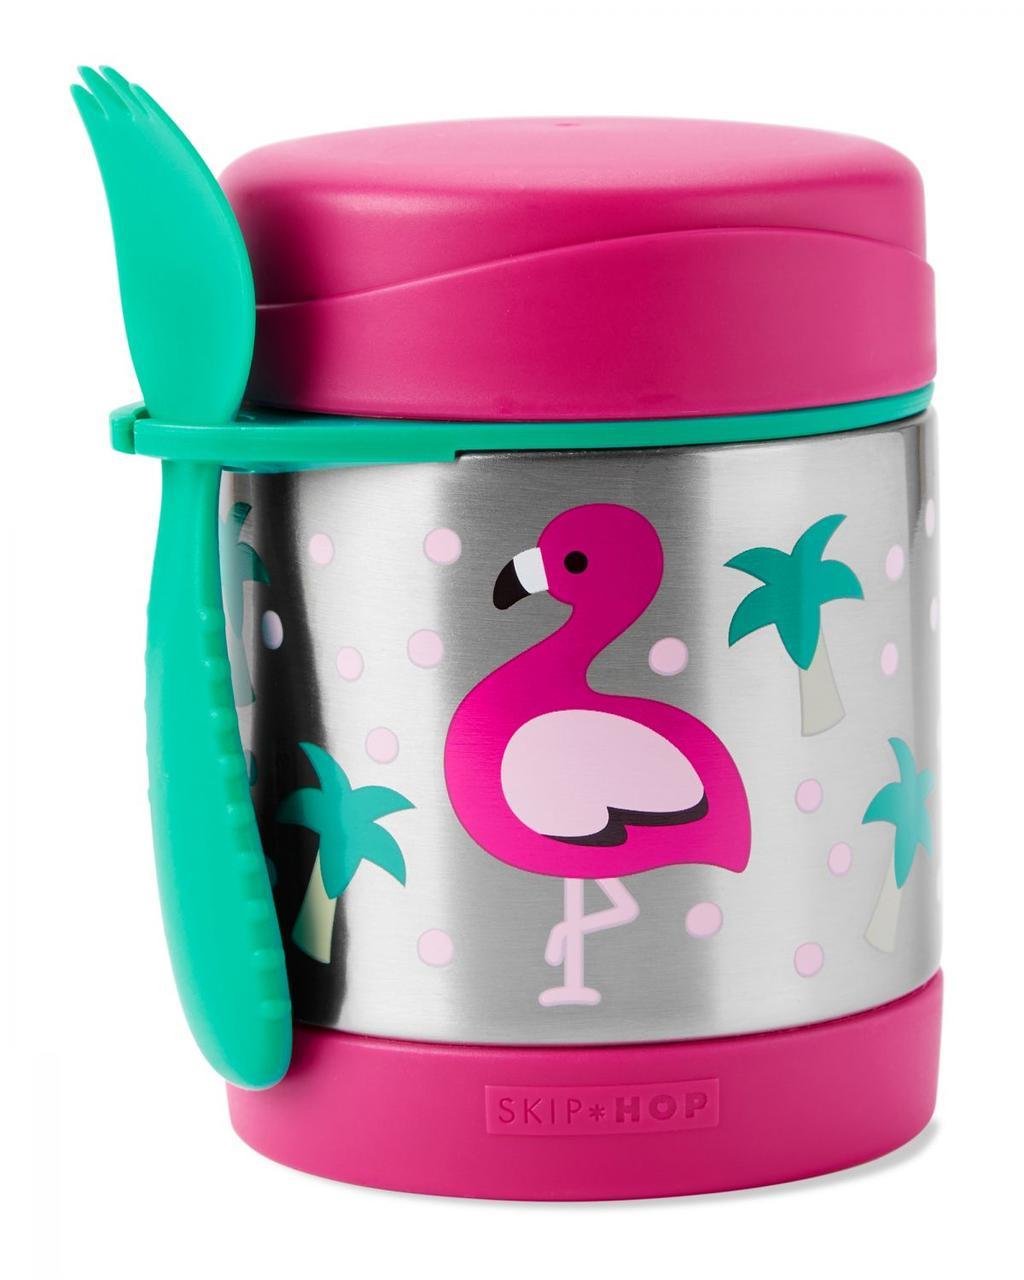 Термос для еды с ложкой-вилкой Skip Hop, 325 мл (Zoo Insulated Little Kid Food Jar) - Flamingo (Фламинго) 12м+